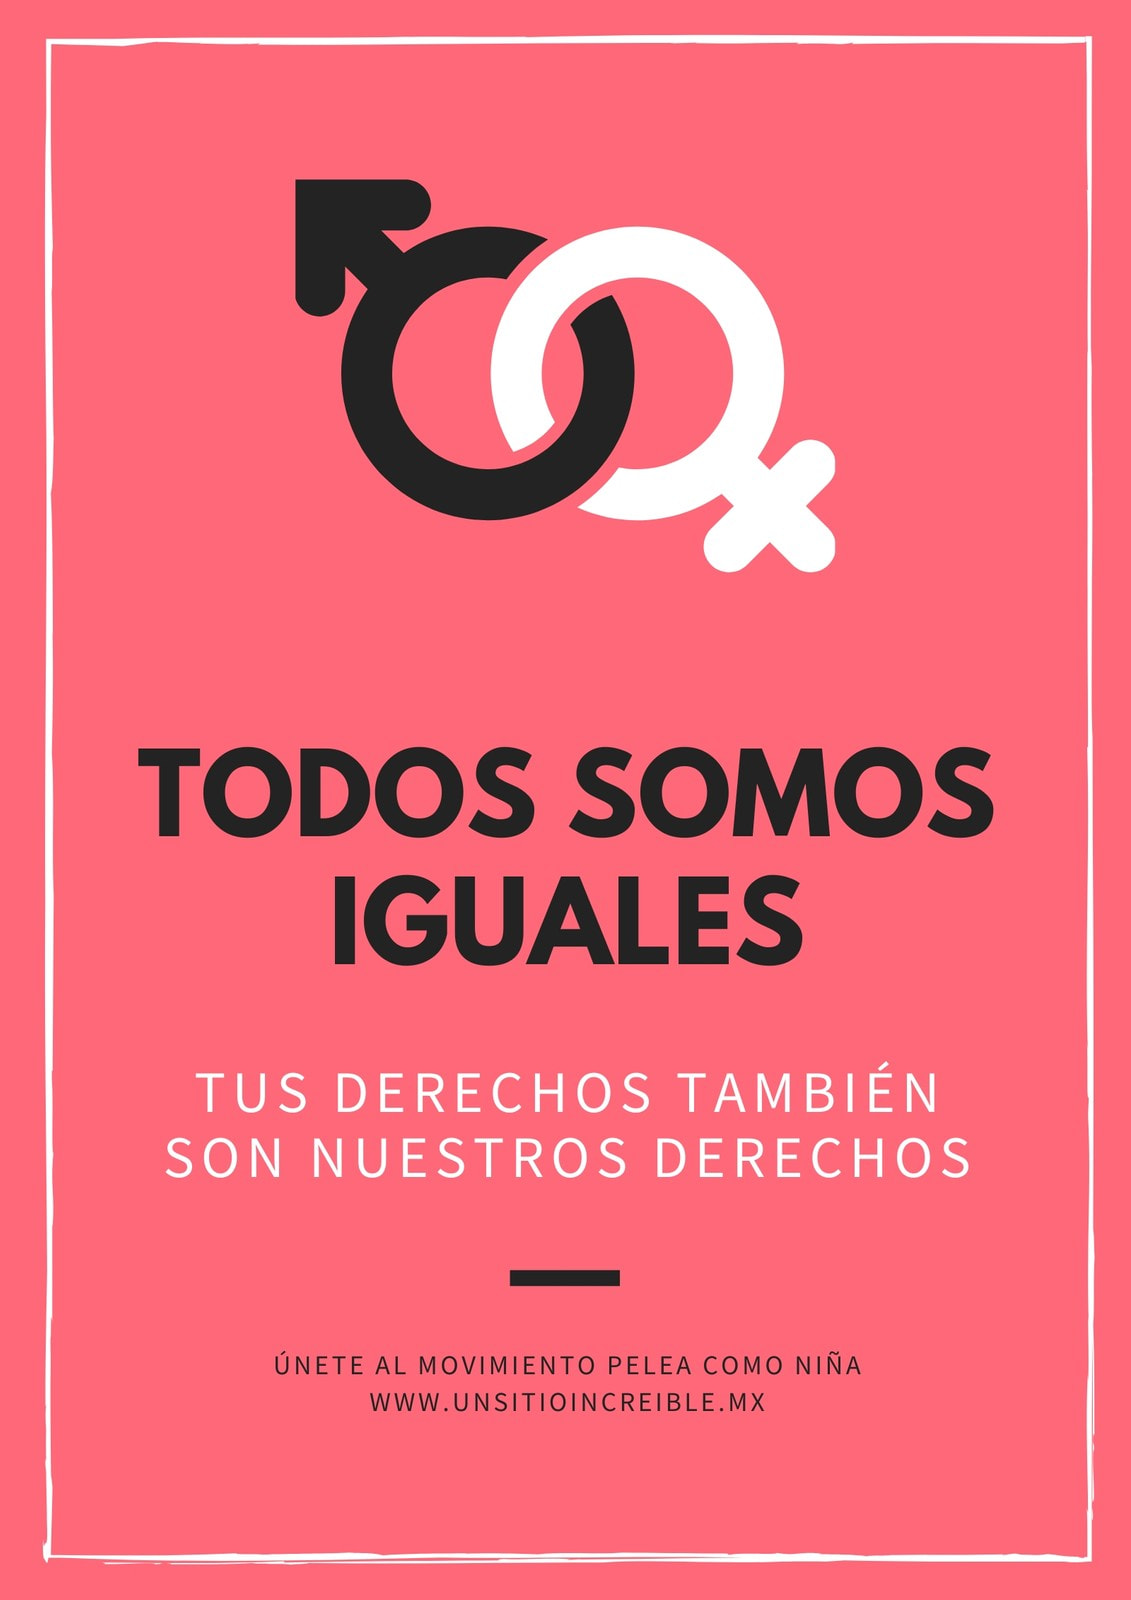 Rosa Salmón Íconos de Géneros Igualdad de Género Póster